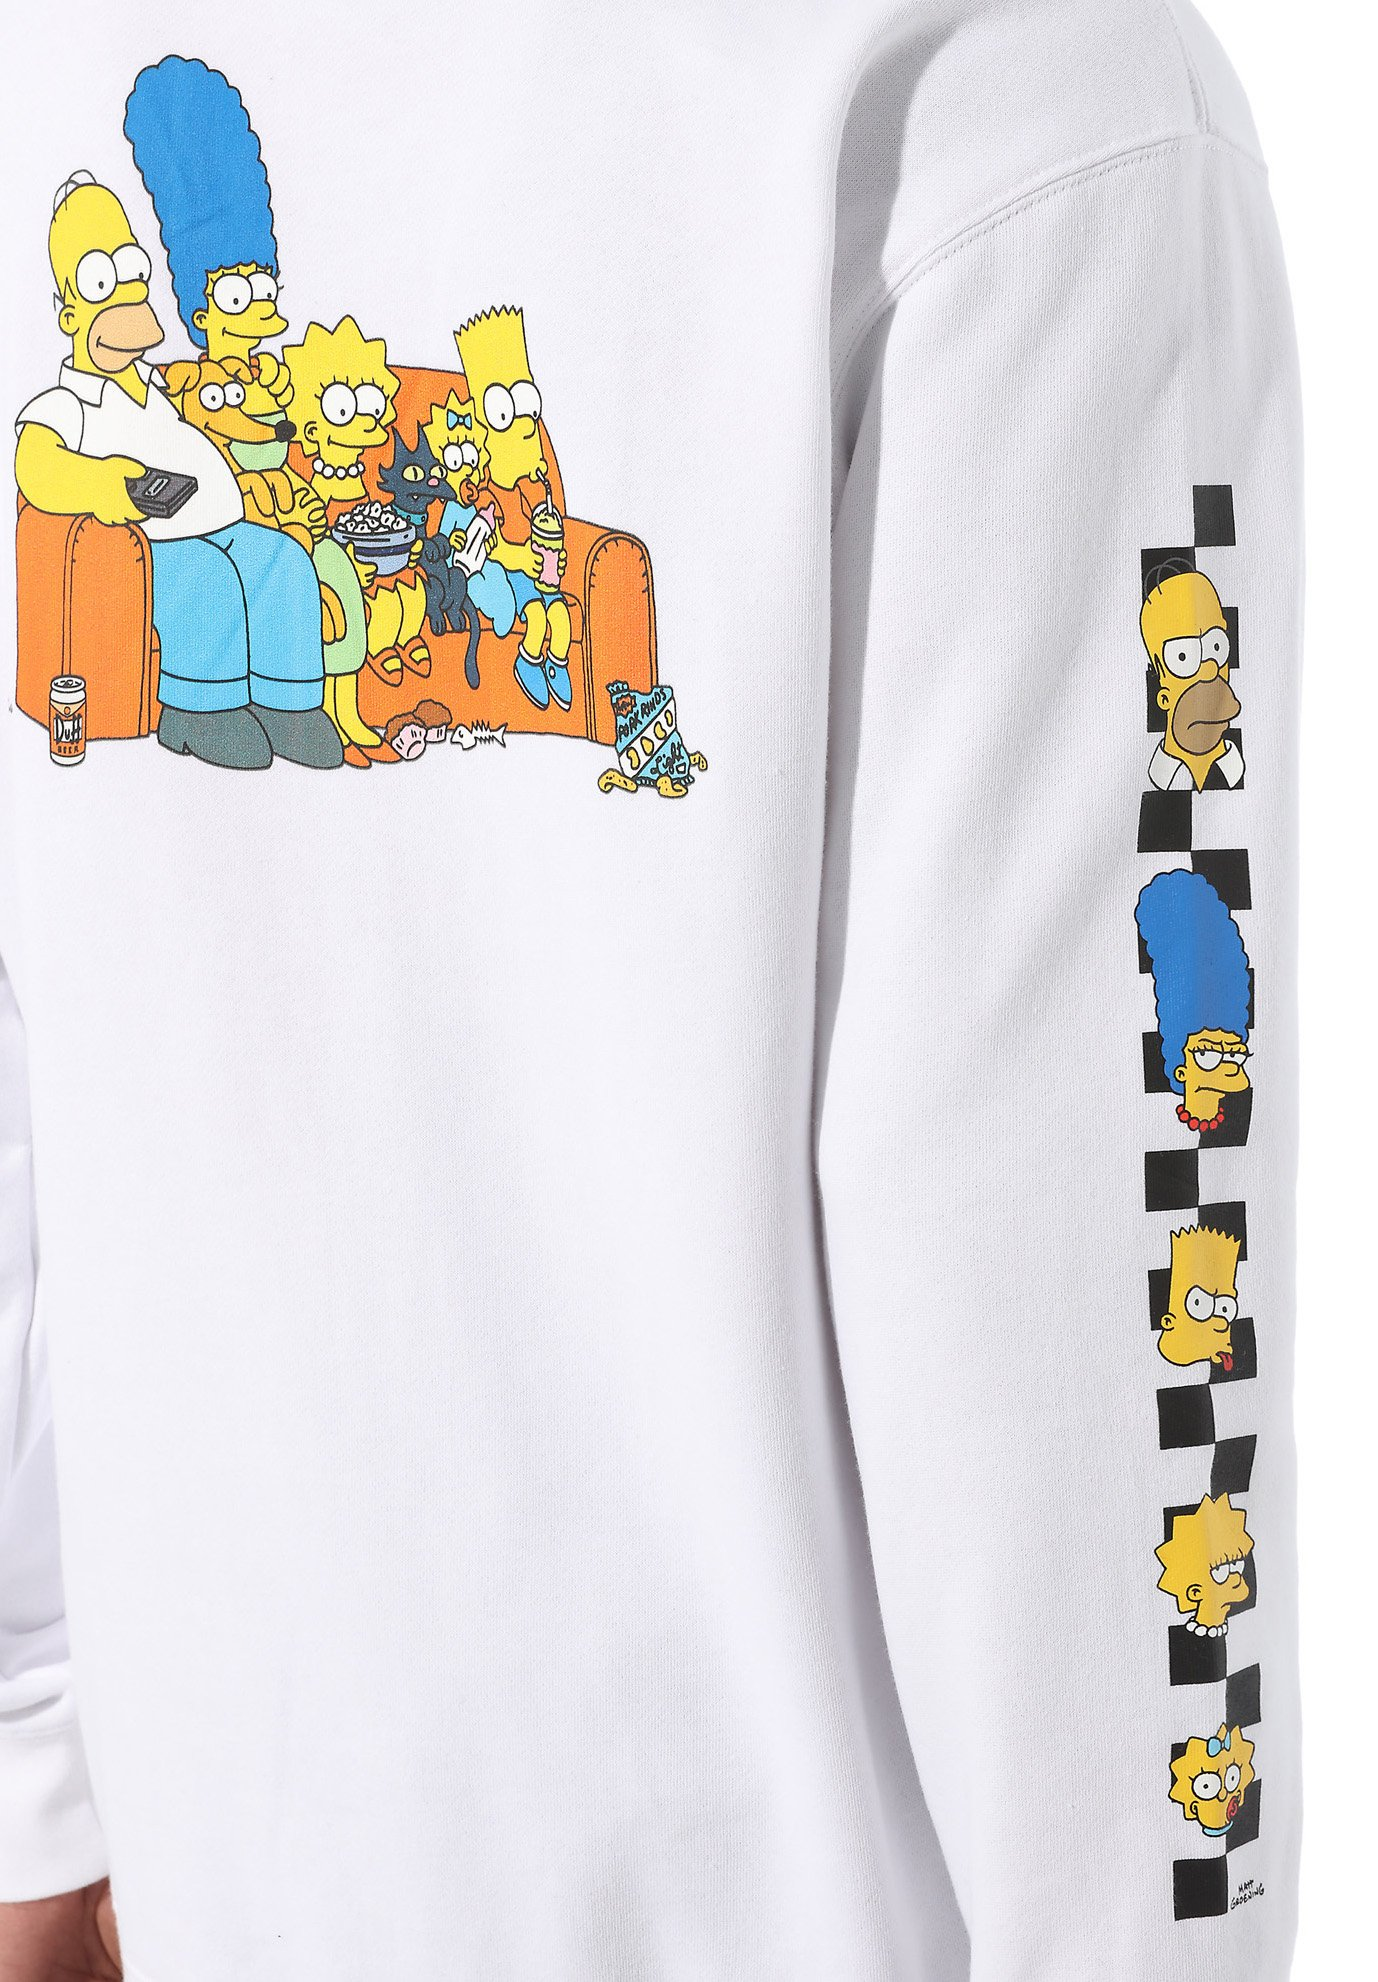 Vans The Simpsons Family Po - Hoodie (the Simpsons)